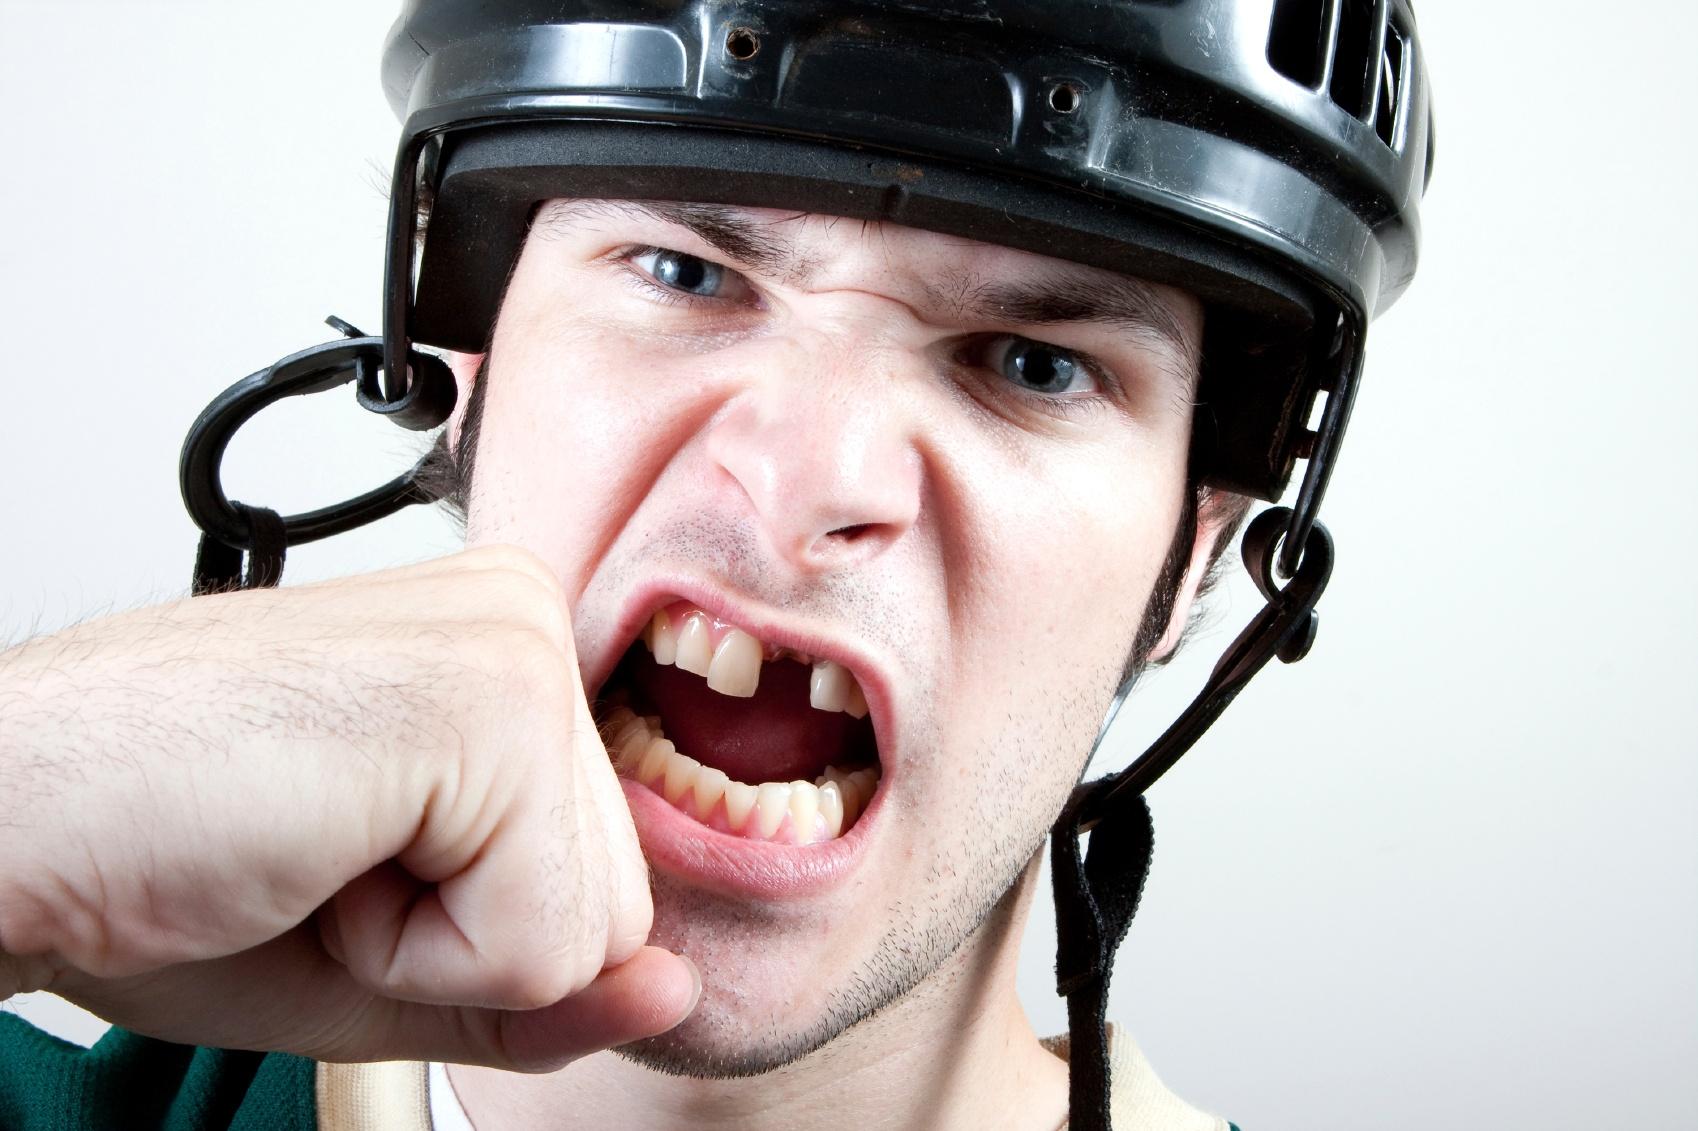 hockey mouth guard teeth